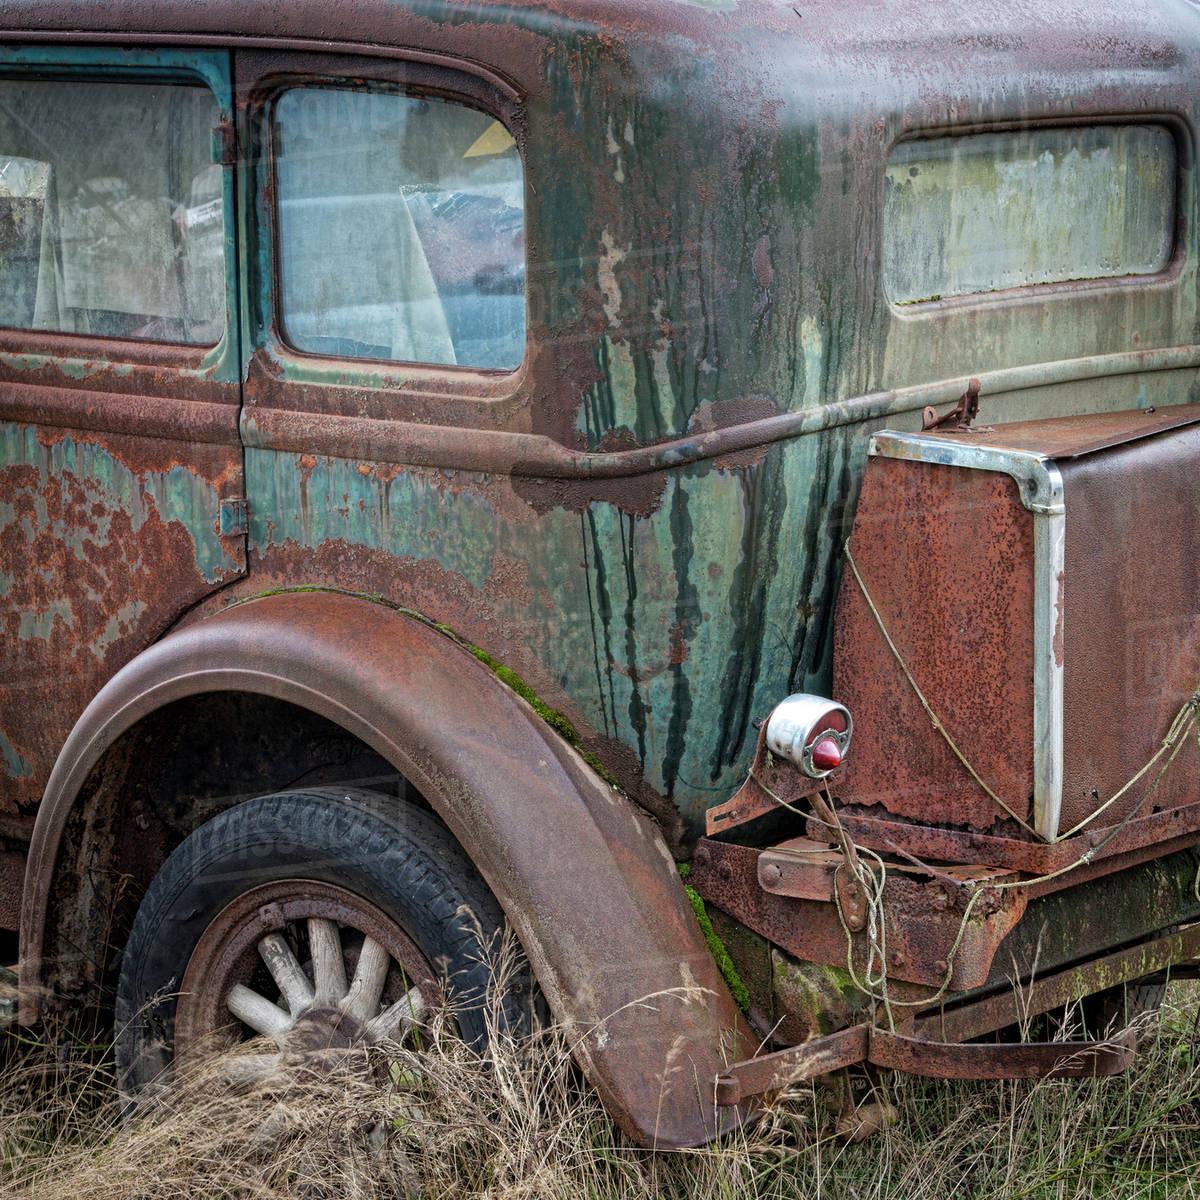 USA, Washington, Belfair. Rusted old car in junkyard. - Stock Photo ...